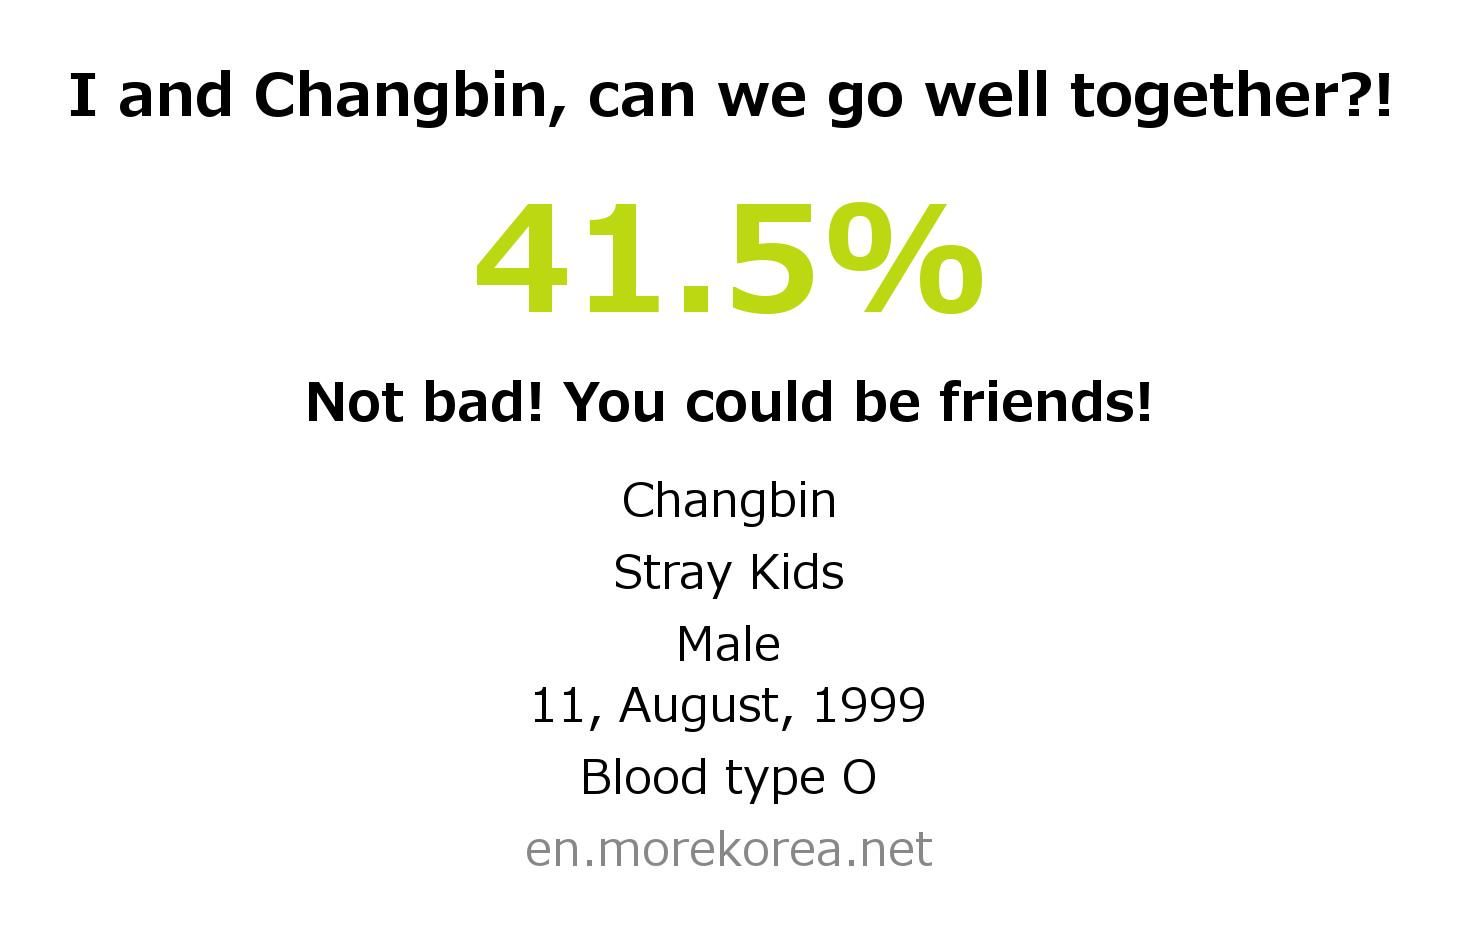 Kpop Idols Matching Fortune Check Changbin Stray Kids Better Together Kpop Idol Birthday Calendar